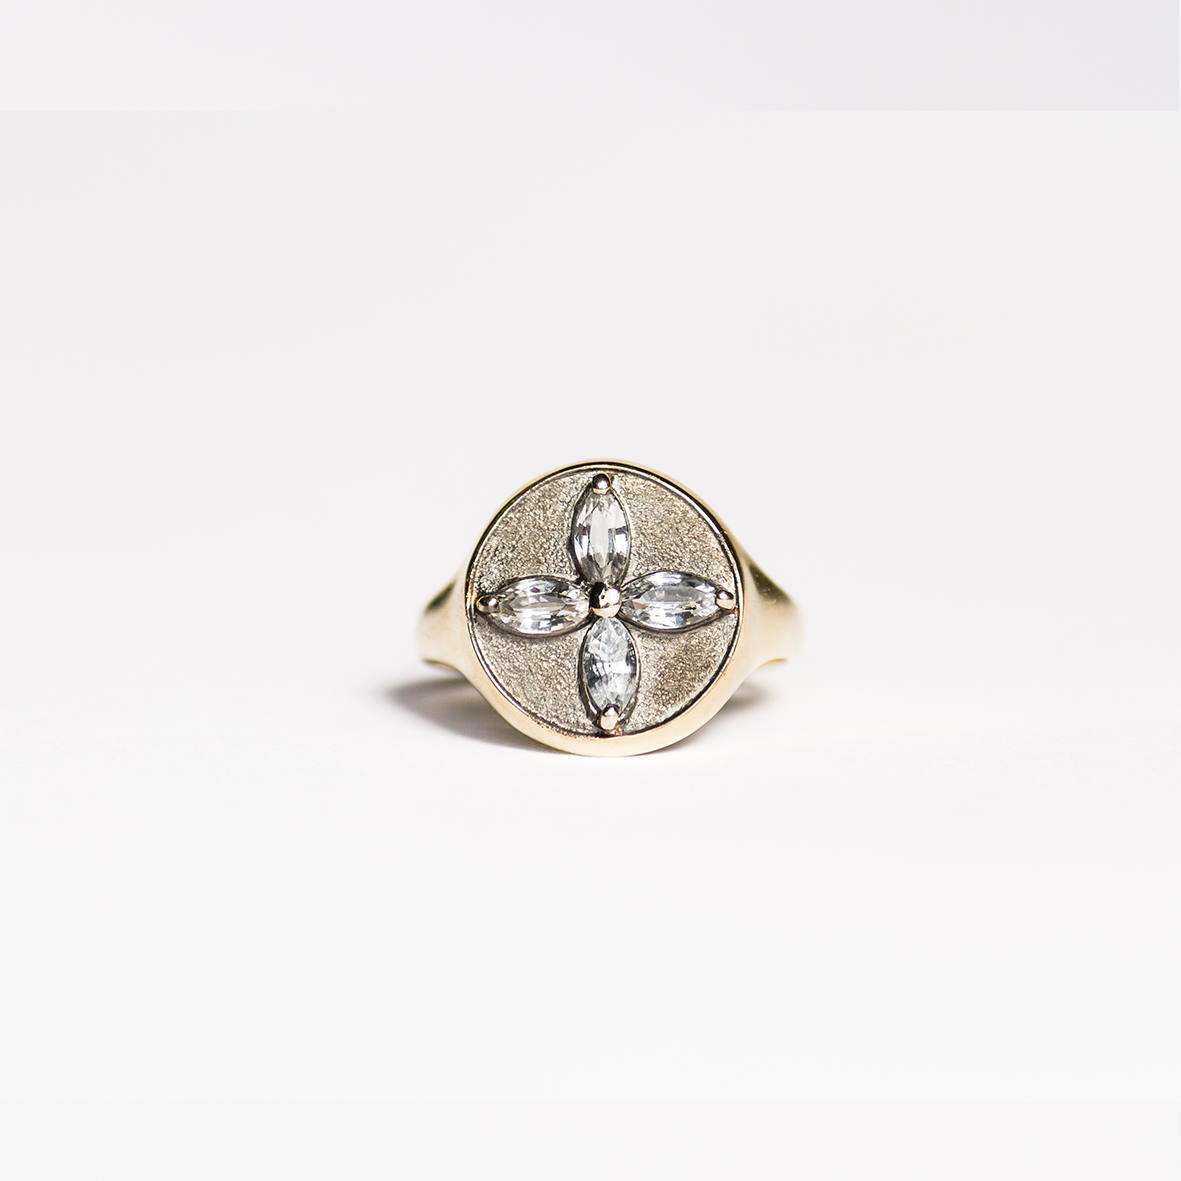 1. OONA_lotus_ficha1_signet flower sapphire ring